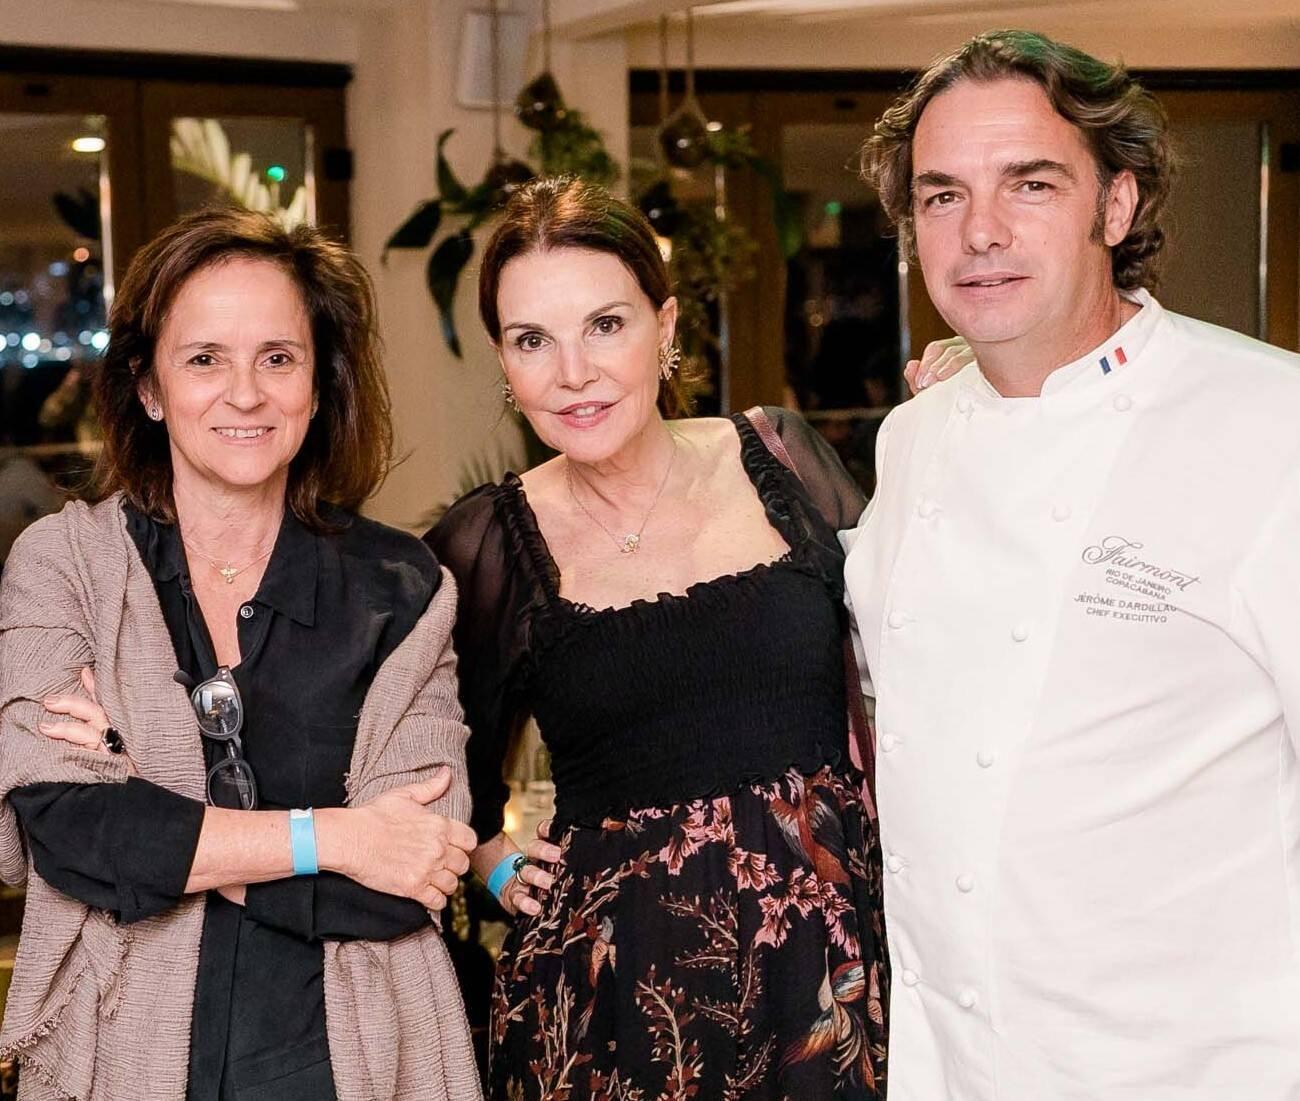 Patricia Quentel, Patricia Mayer e Jérôme Dardillac /Foto: Miguel Sá